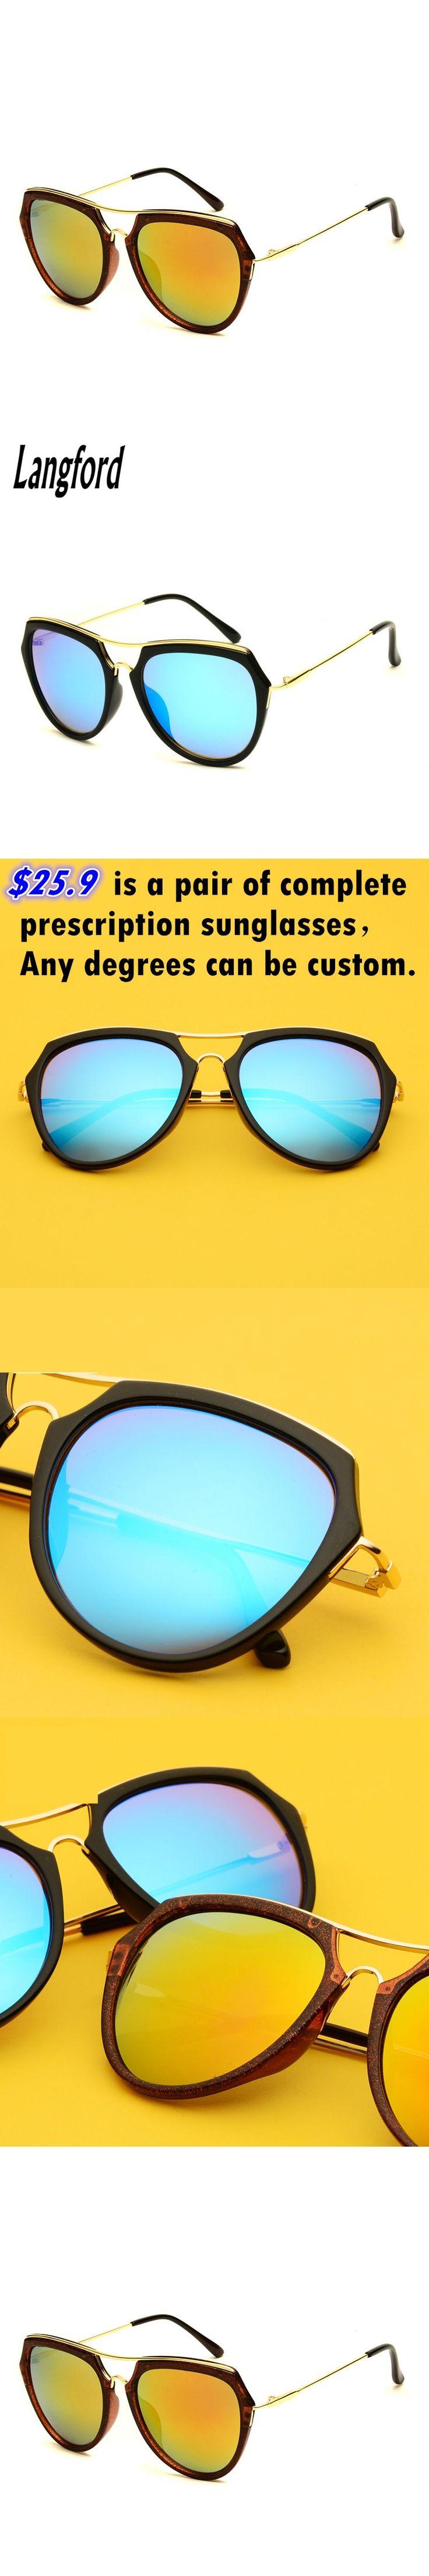 langford prescription sunglasses woman double Bridge fashion Polarized vintage sunglasses gold mirror lens